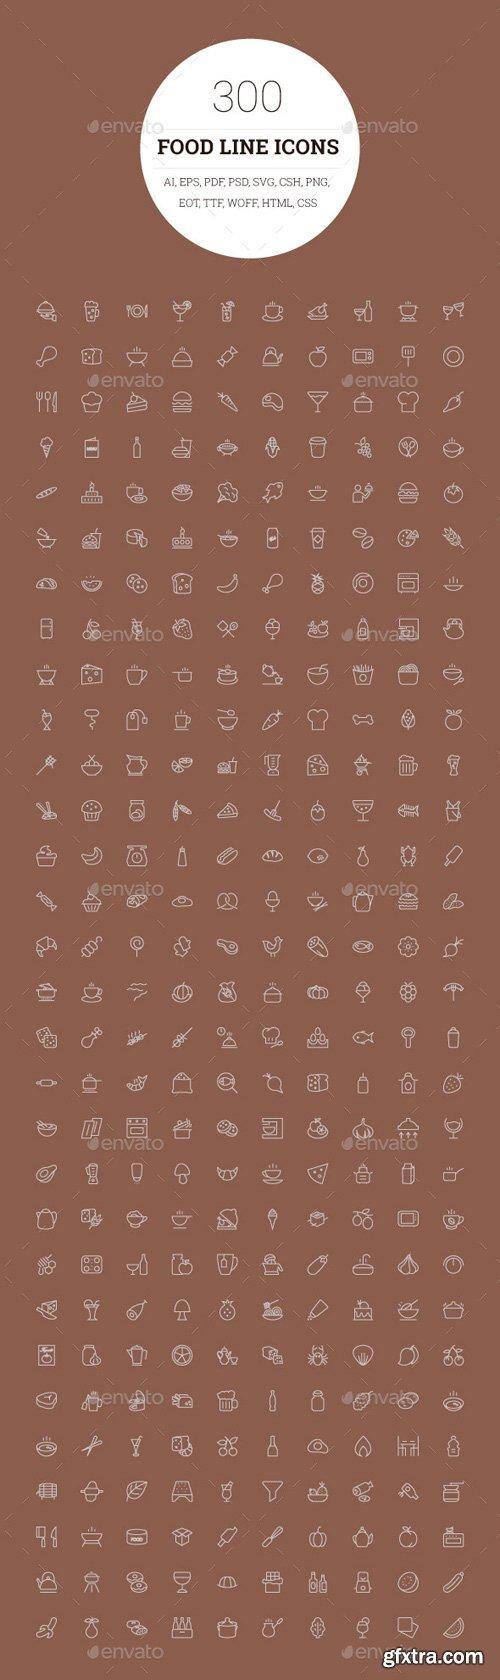 CM 114562 - 300 Food Line Icons